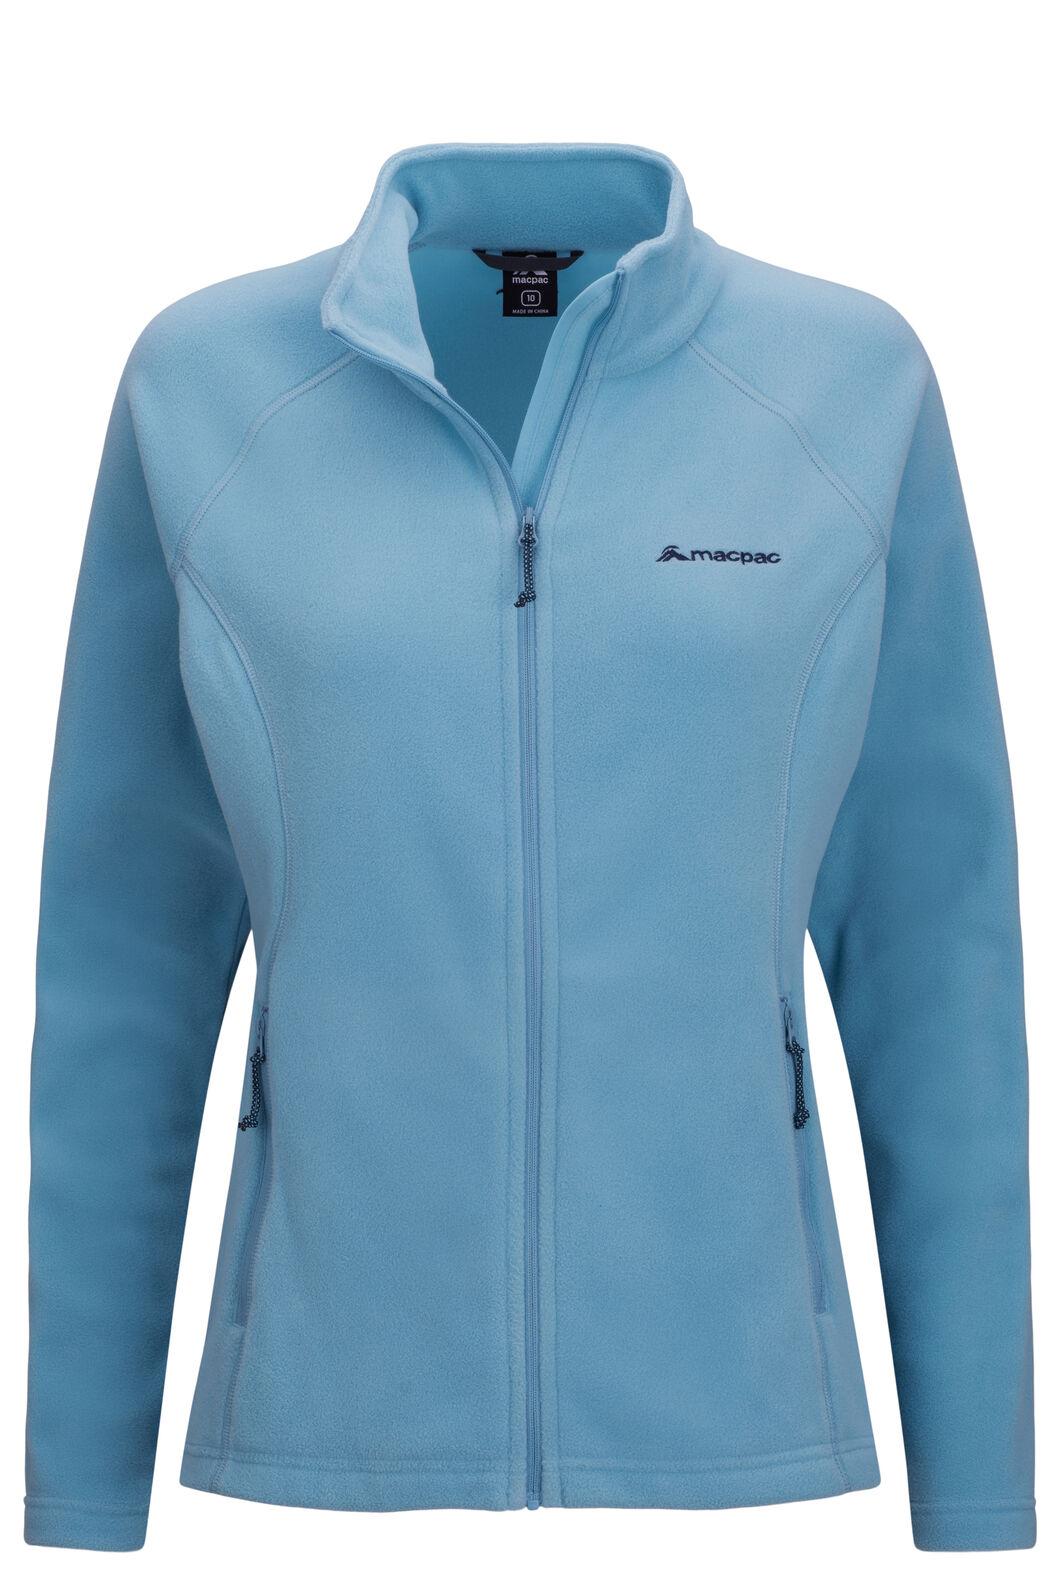 Macpac Tui Polartec® Micro Fleece® Jacket — Women's, Delphinium, hi-res